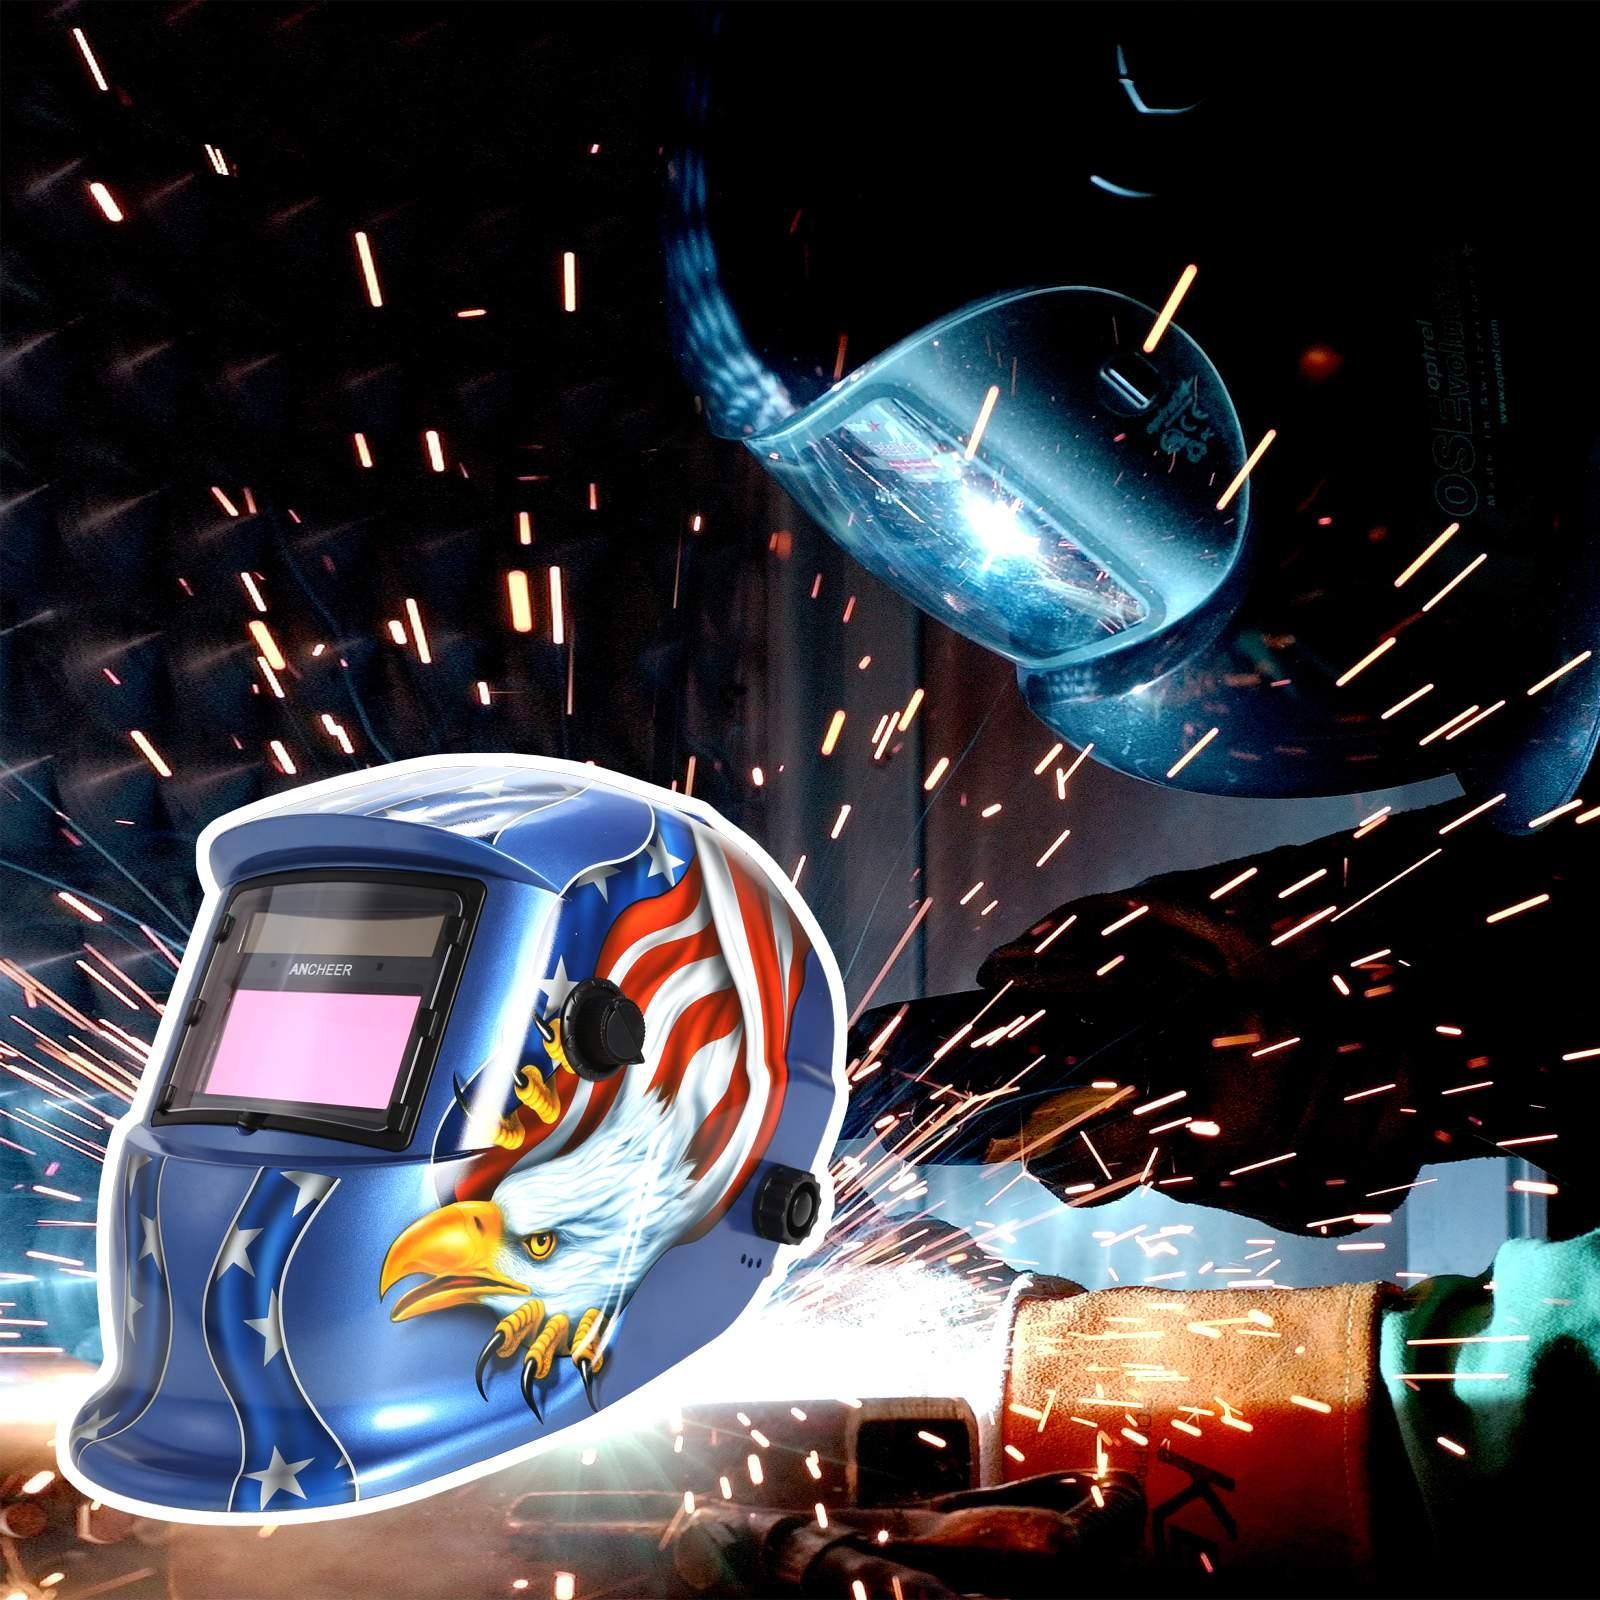 Solar Powered Welding Helmet Auto Darkening Hood with Adjustable Shade For Mig Tig Arc Welder Mask Blue EaglePattern by